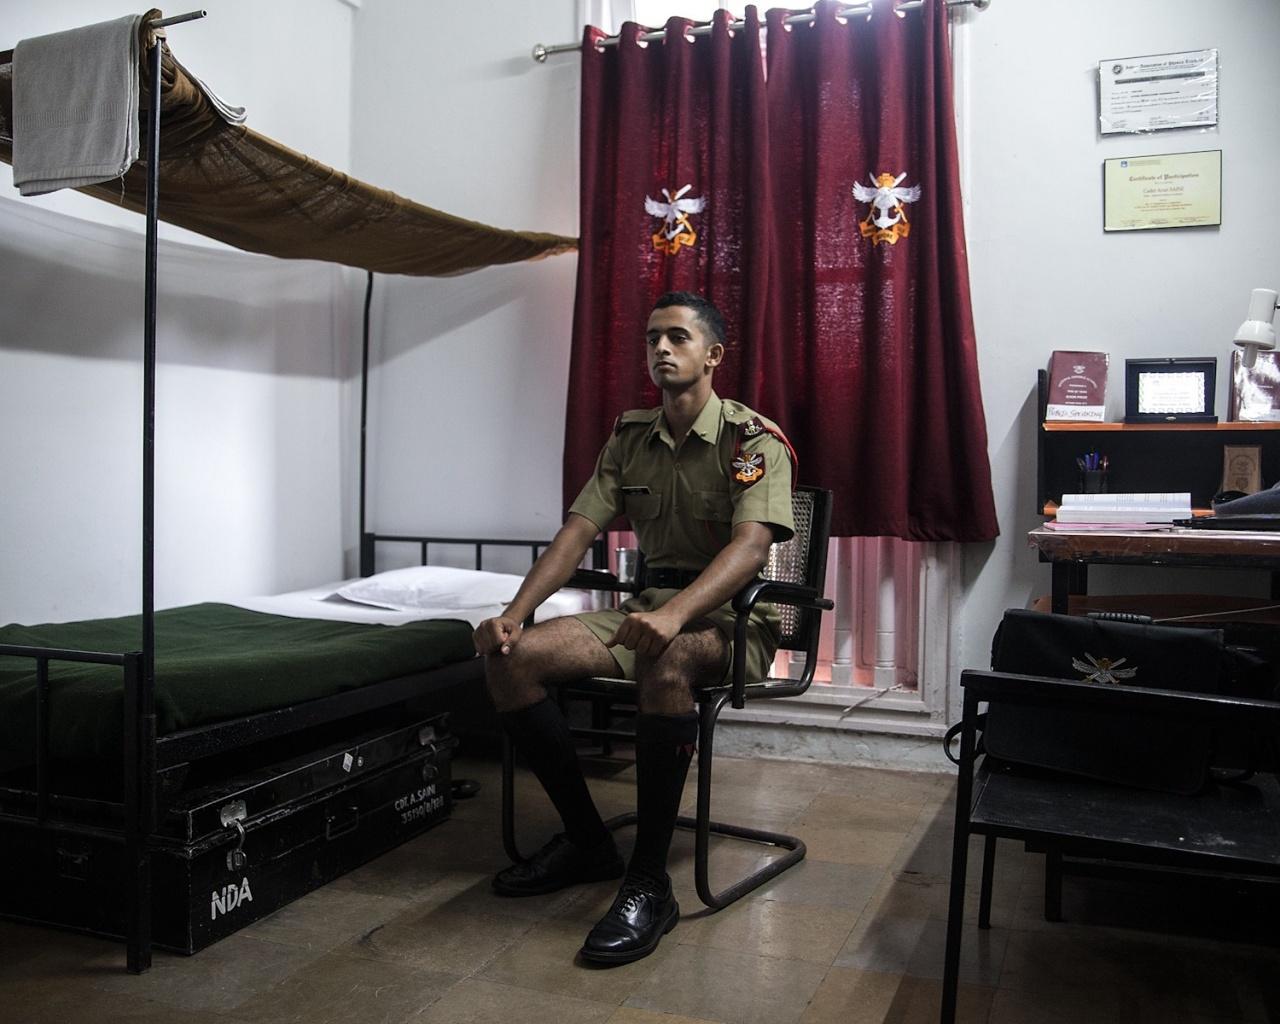 Portrait of a Cadet